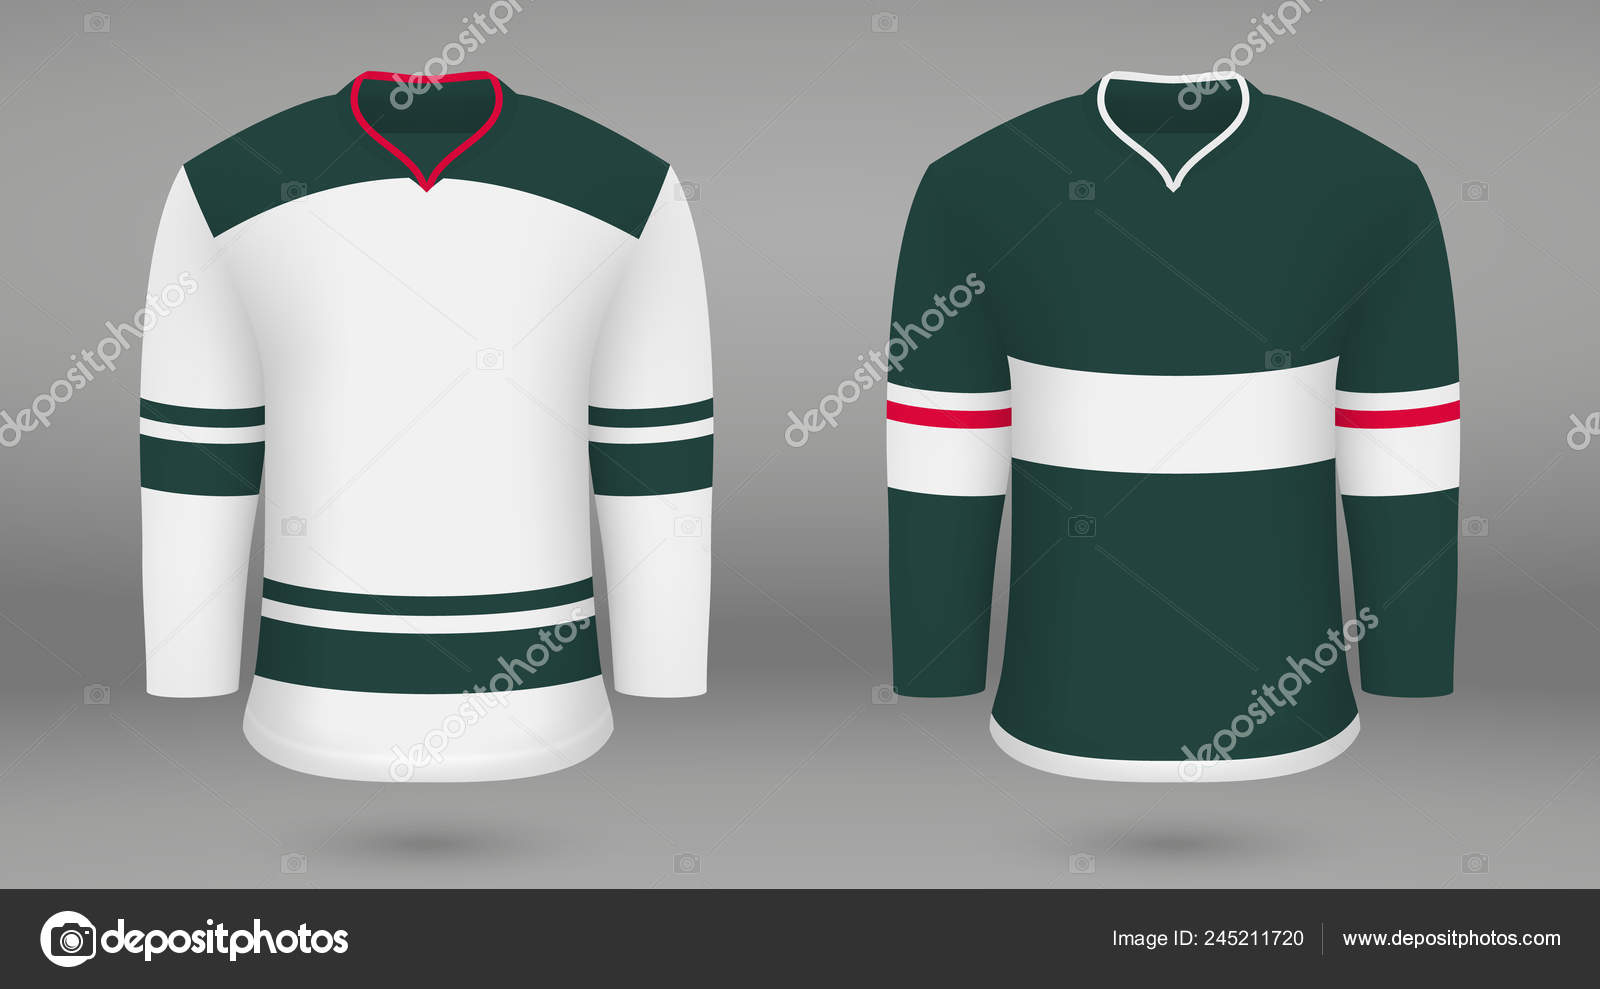 reputable site a483e c28f2 Pictures: minnesota wild hockey | Realistic Hockey Kit Shirt ...